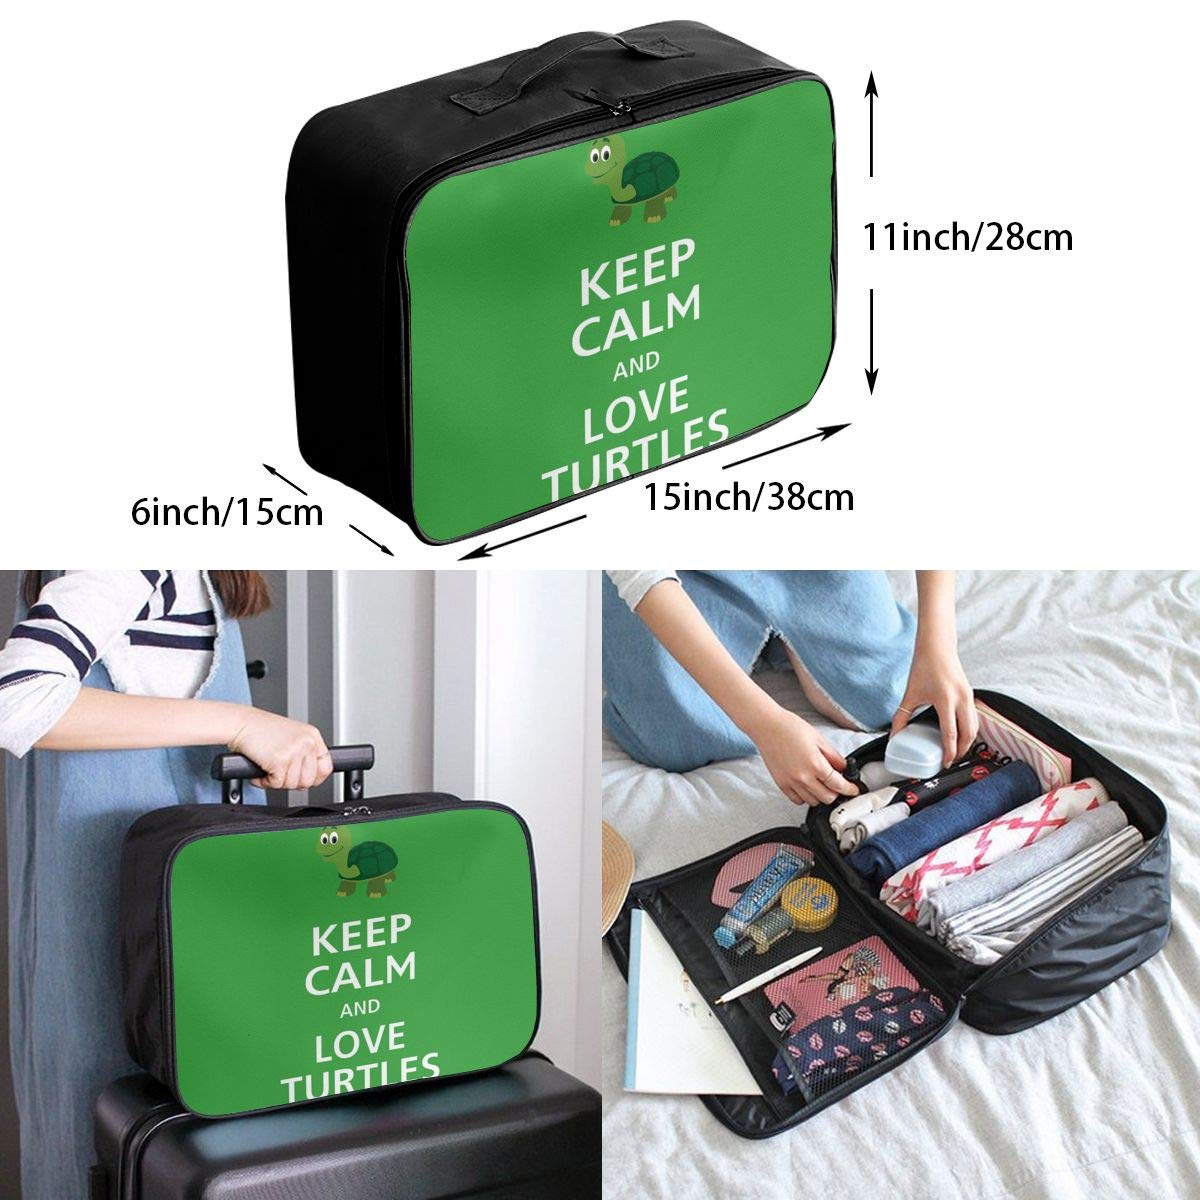 Travel Luggage Duffle Bag Lightweight Portable Handbag Love Turtles Large Capacity Waterproof Foldable Storage Tote